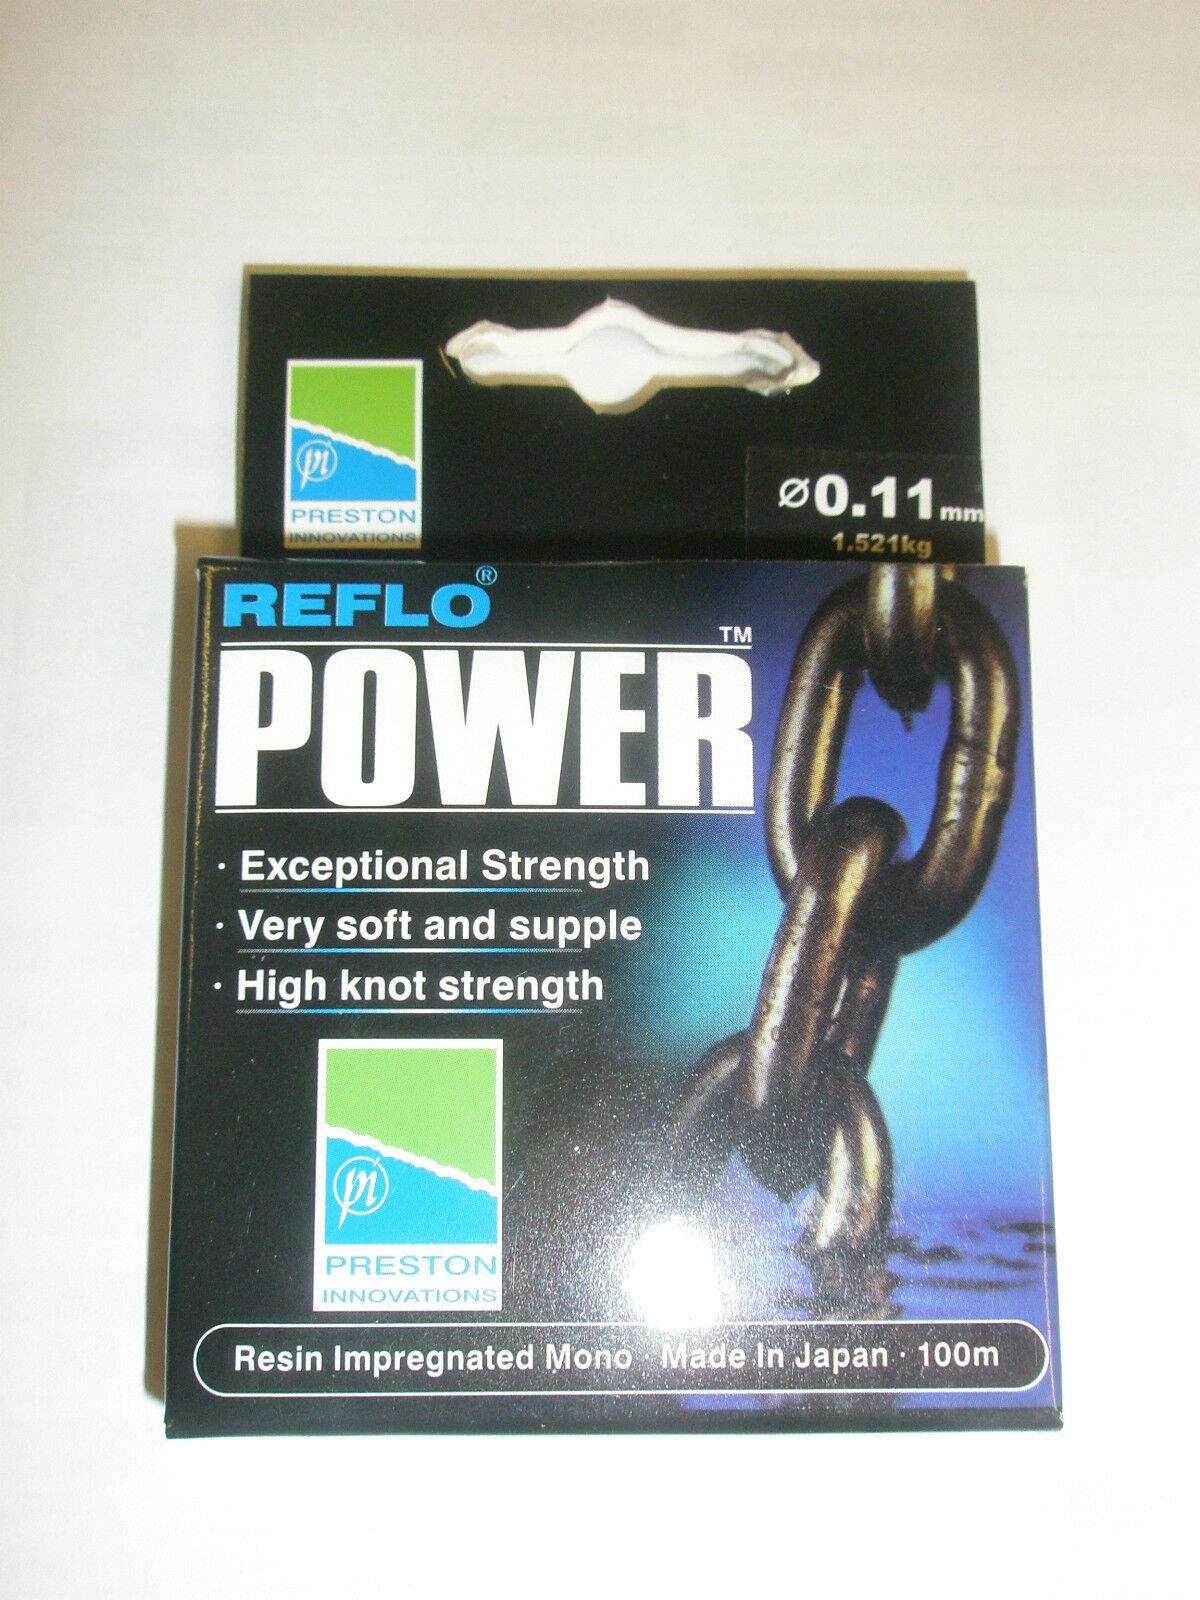 Preston Innovations Reflo POWER LINE VARIOUS SIZES Made in JAPAN